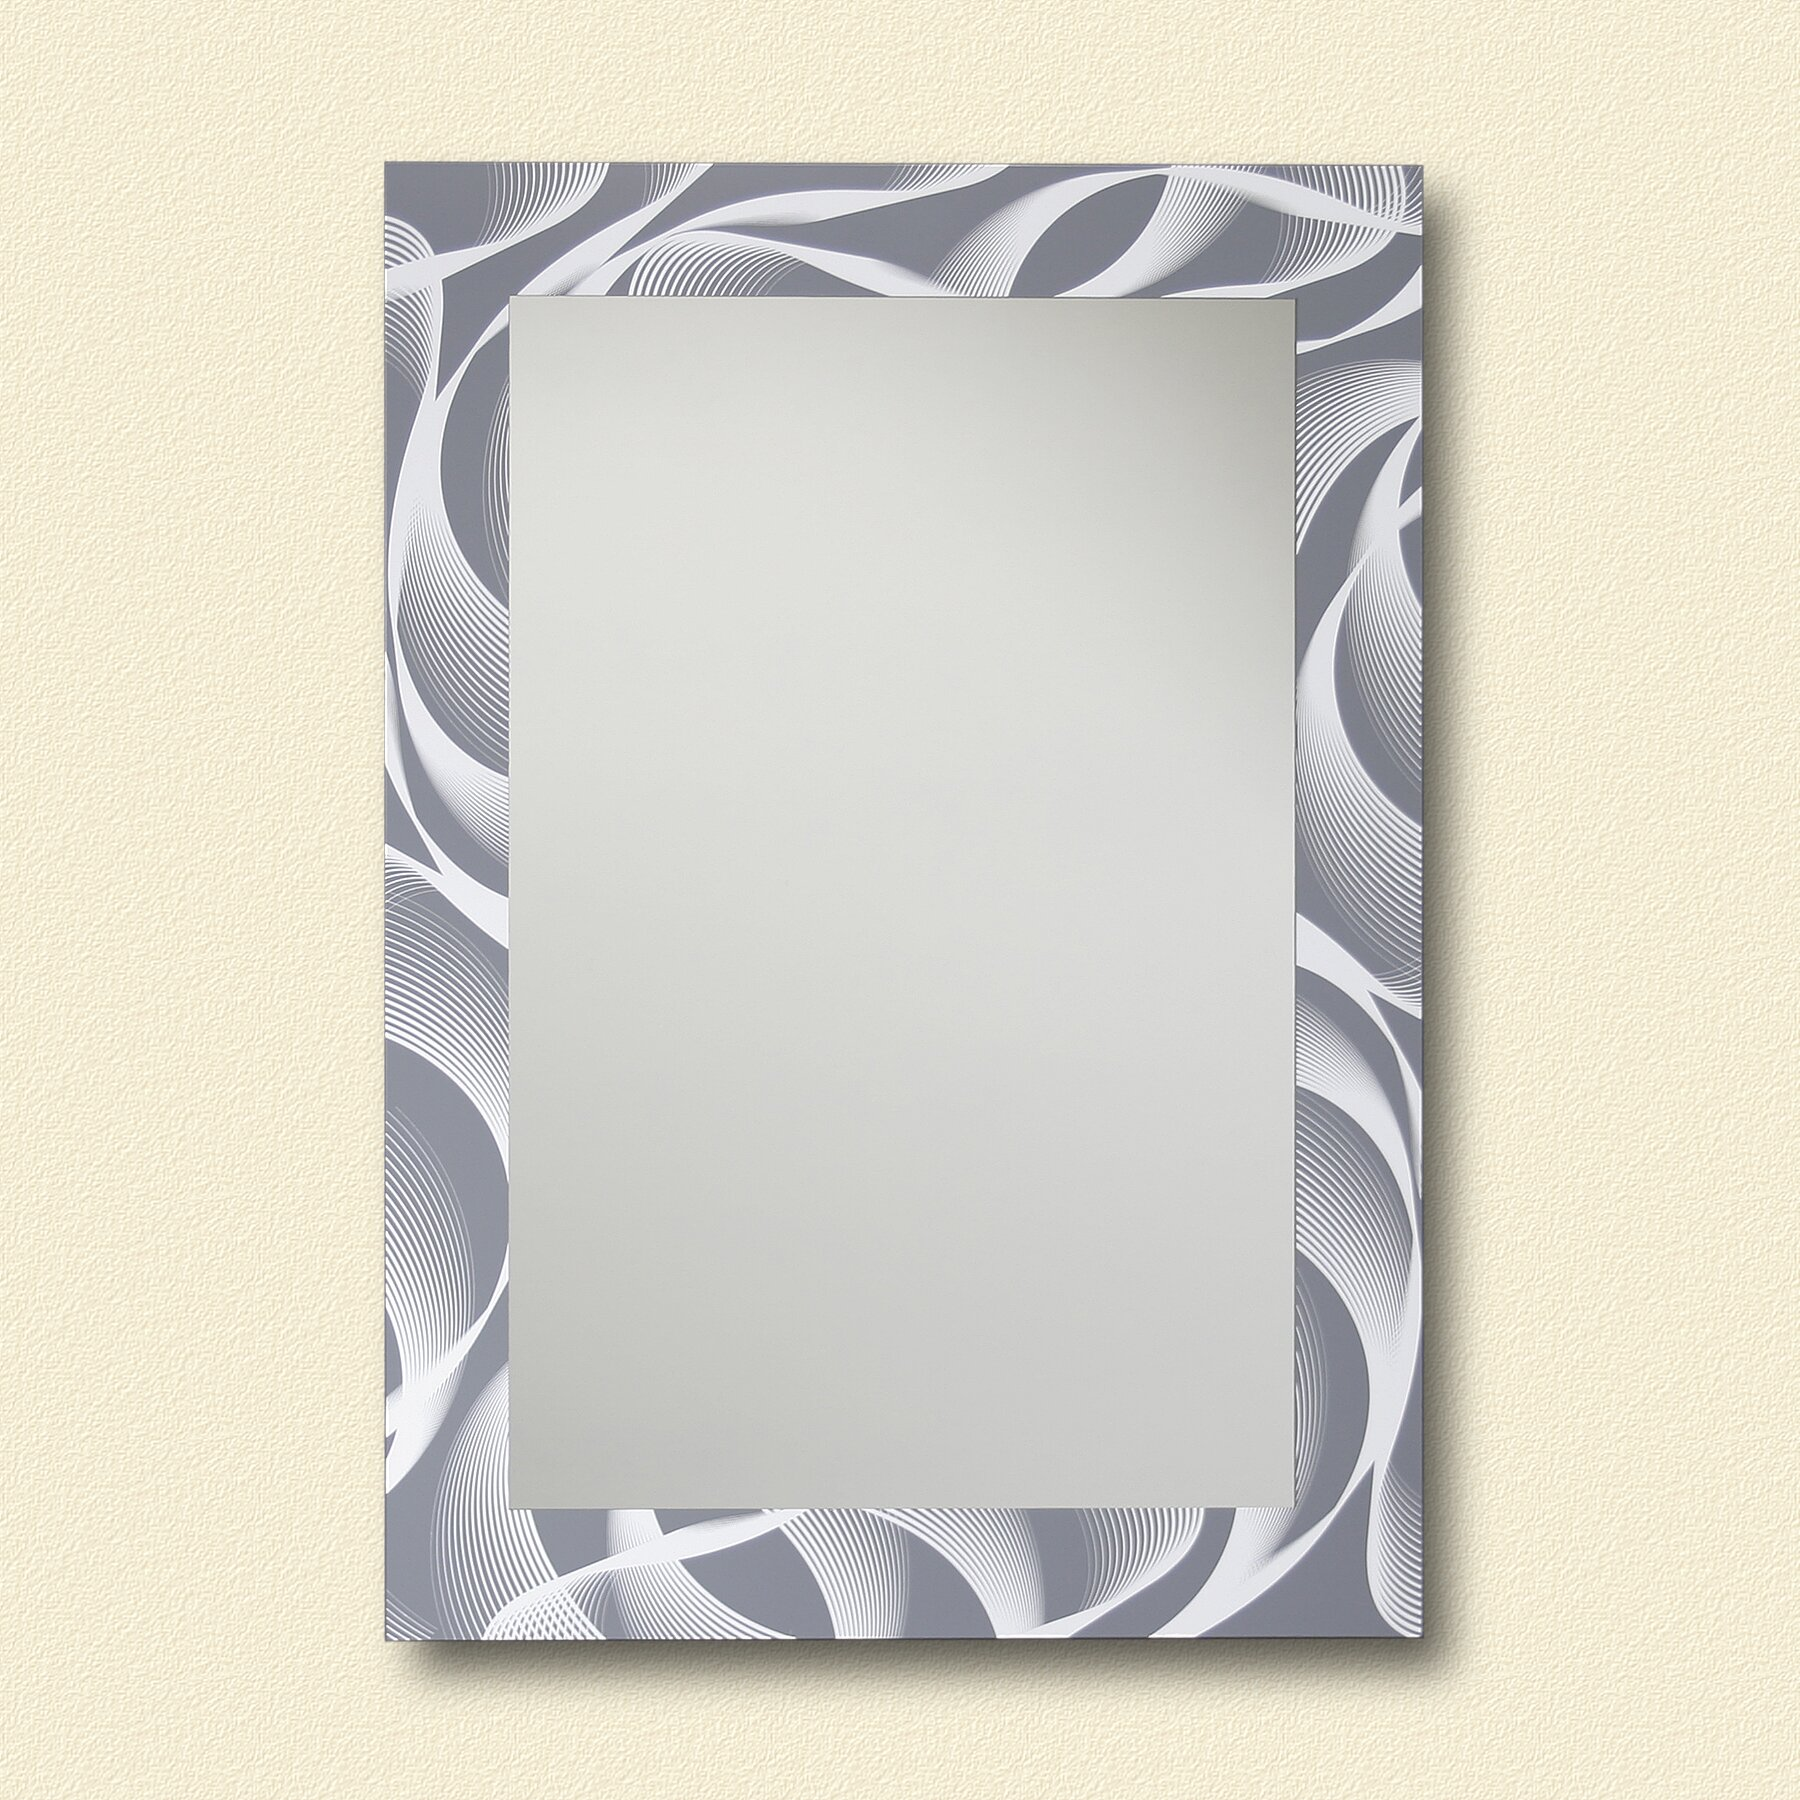 Leick ReflectU Swirl Decorative Wall Mirror & Reviews ...